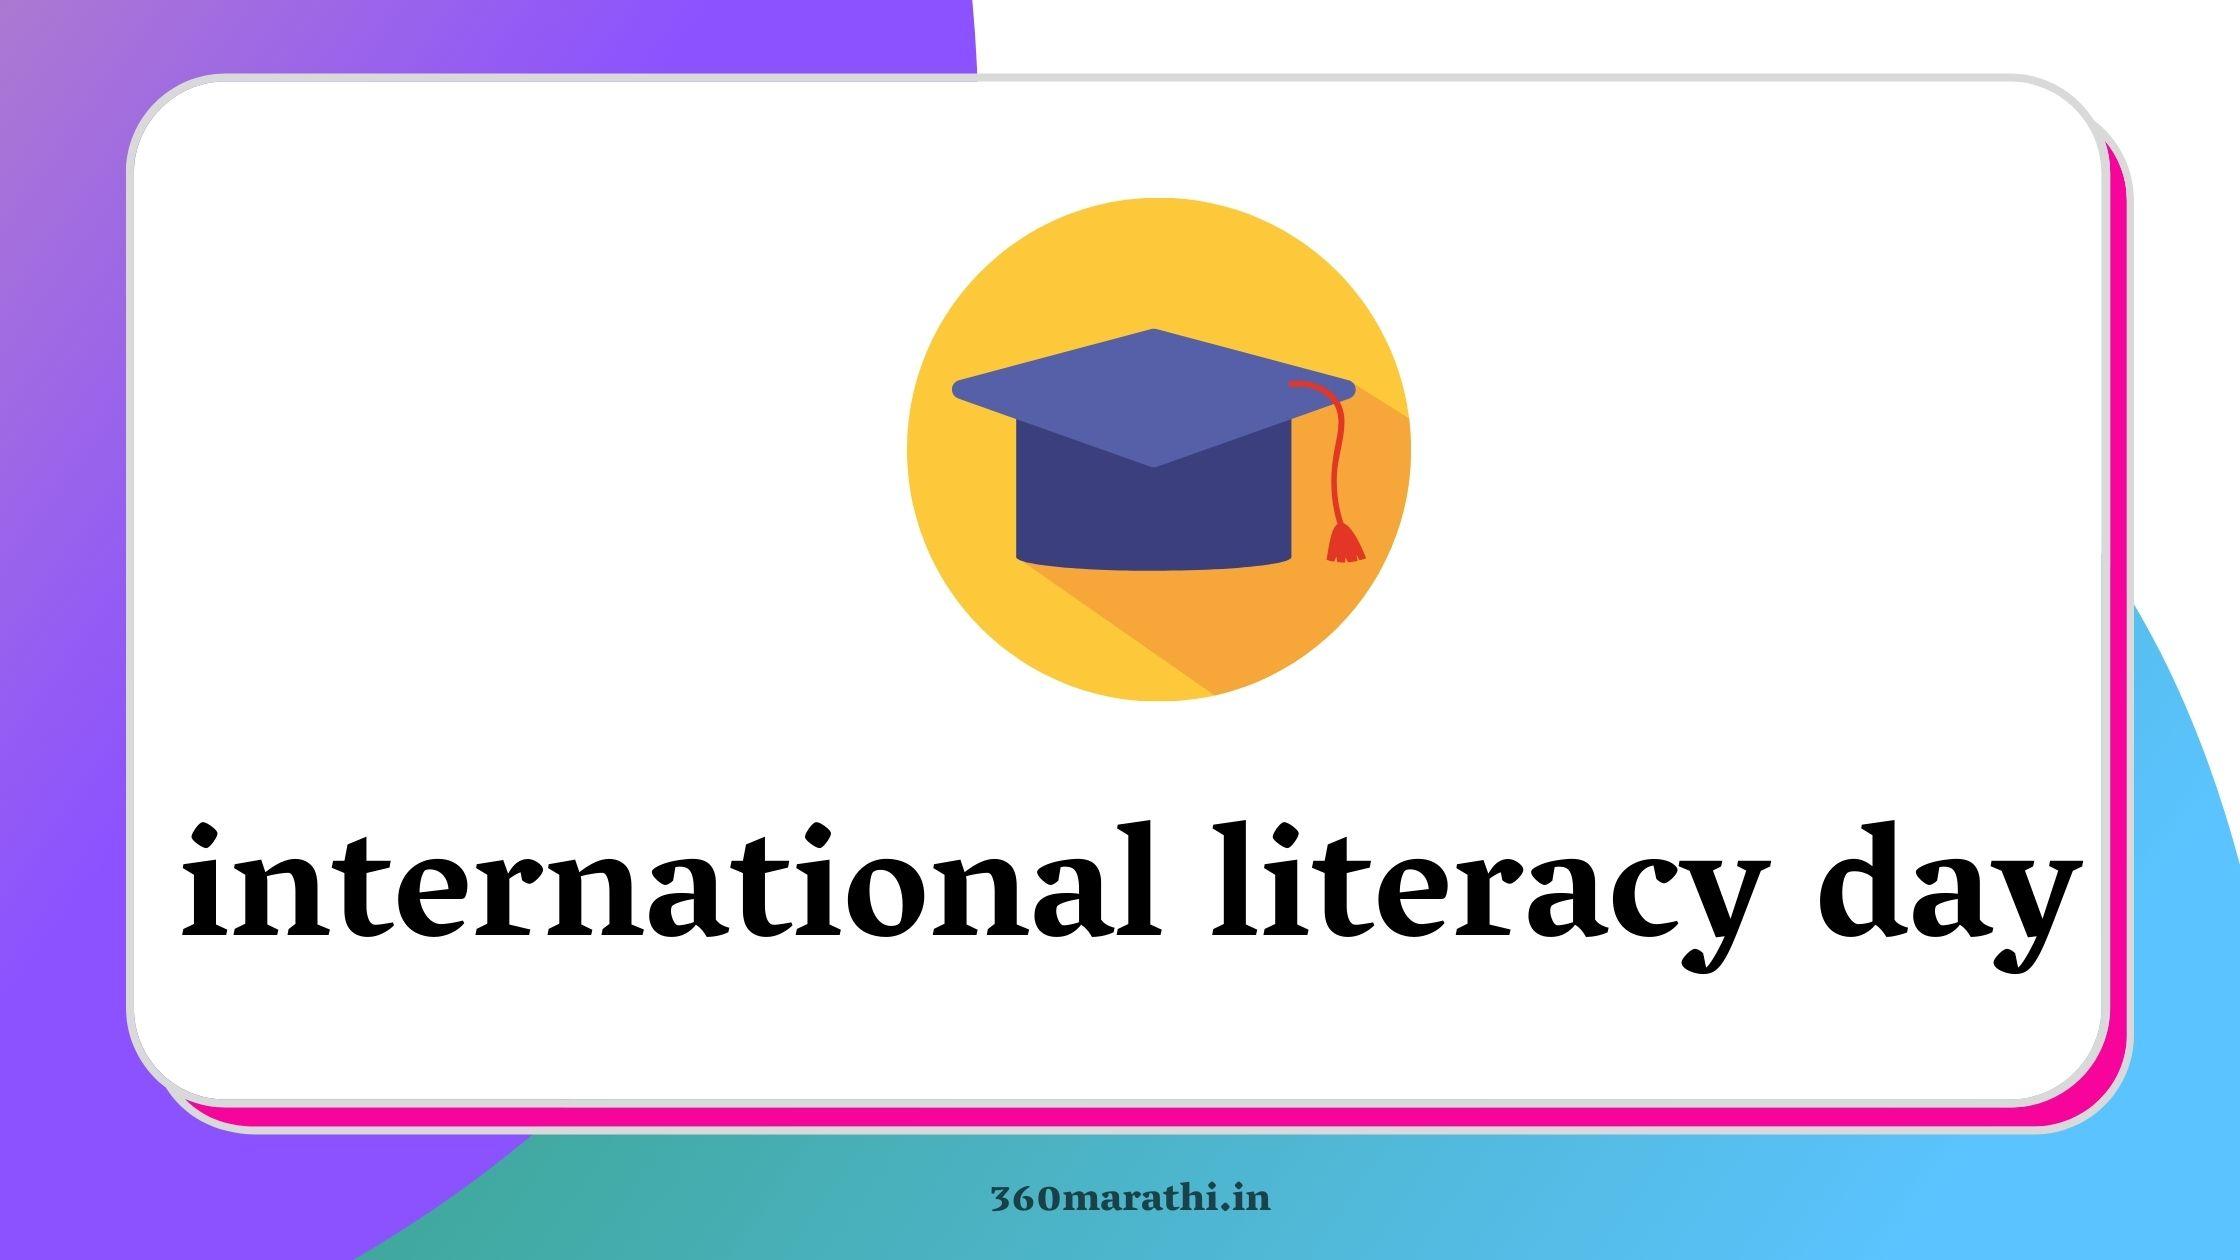 काय आहे आंतरराष्ट्रीय साक्षरता दिवस   international literacy day in marathi